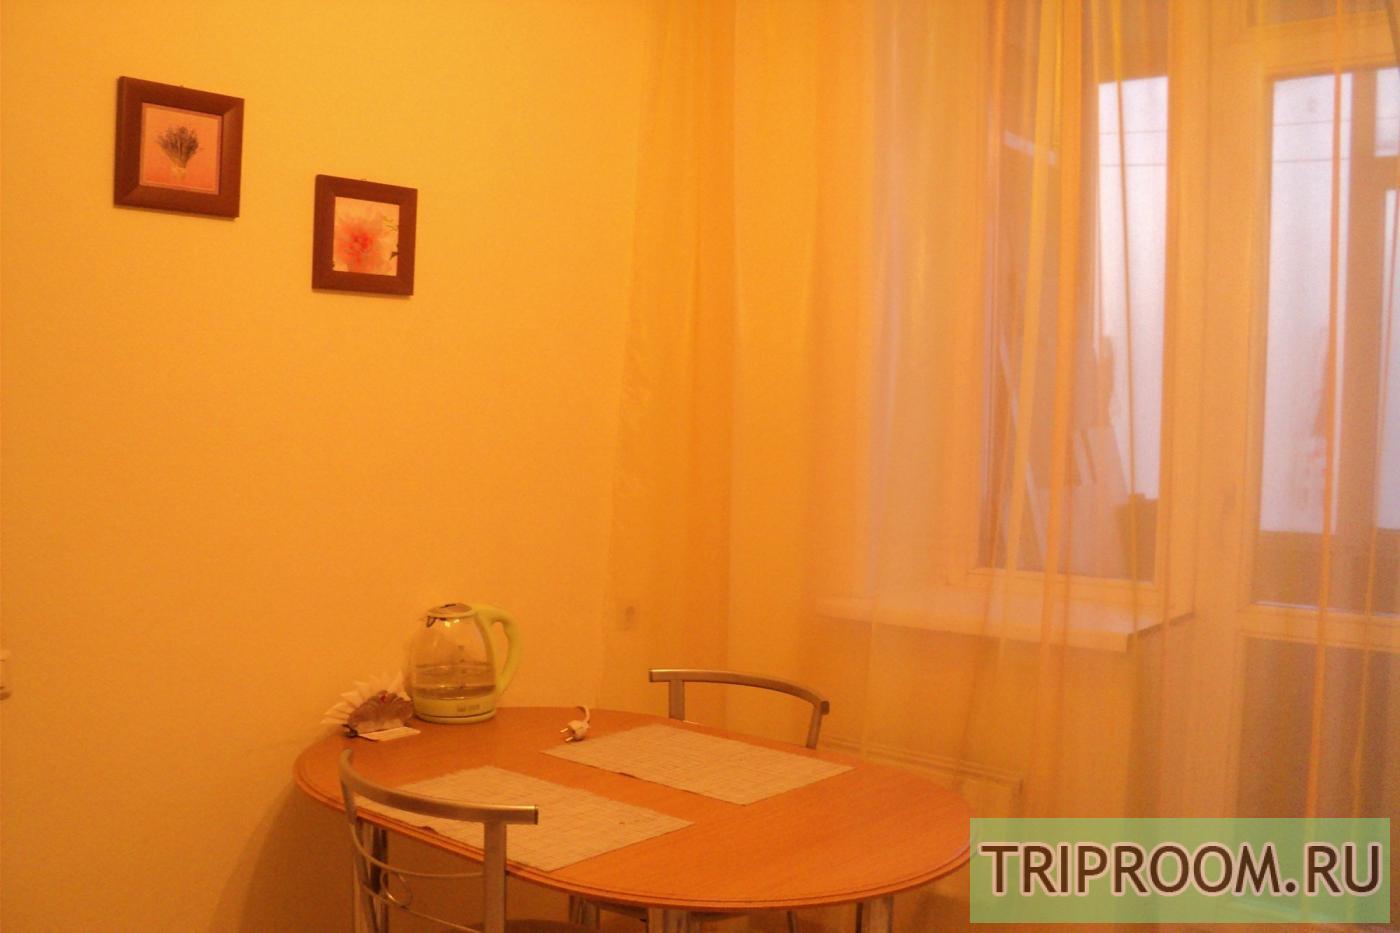 1-комнатная квартира посуточно (вариант № 5905), ул. Алексеева улица, фото № 5